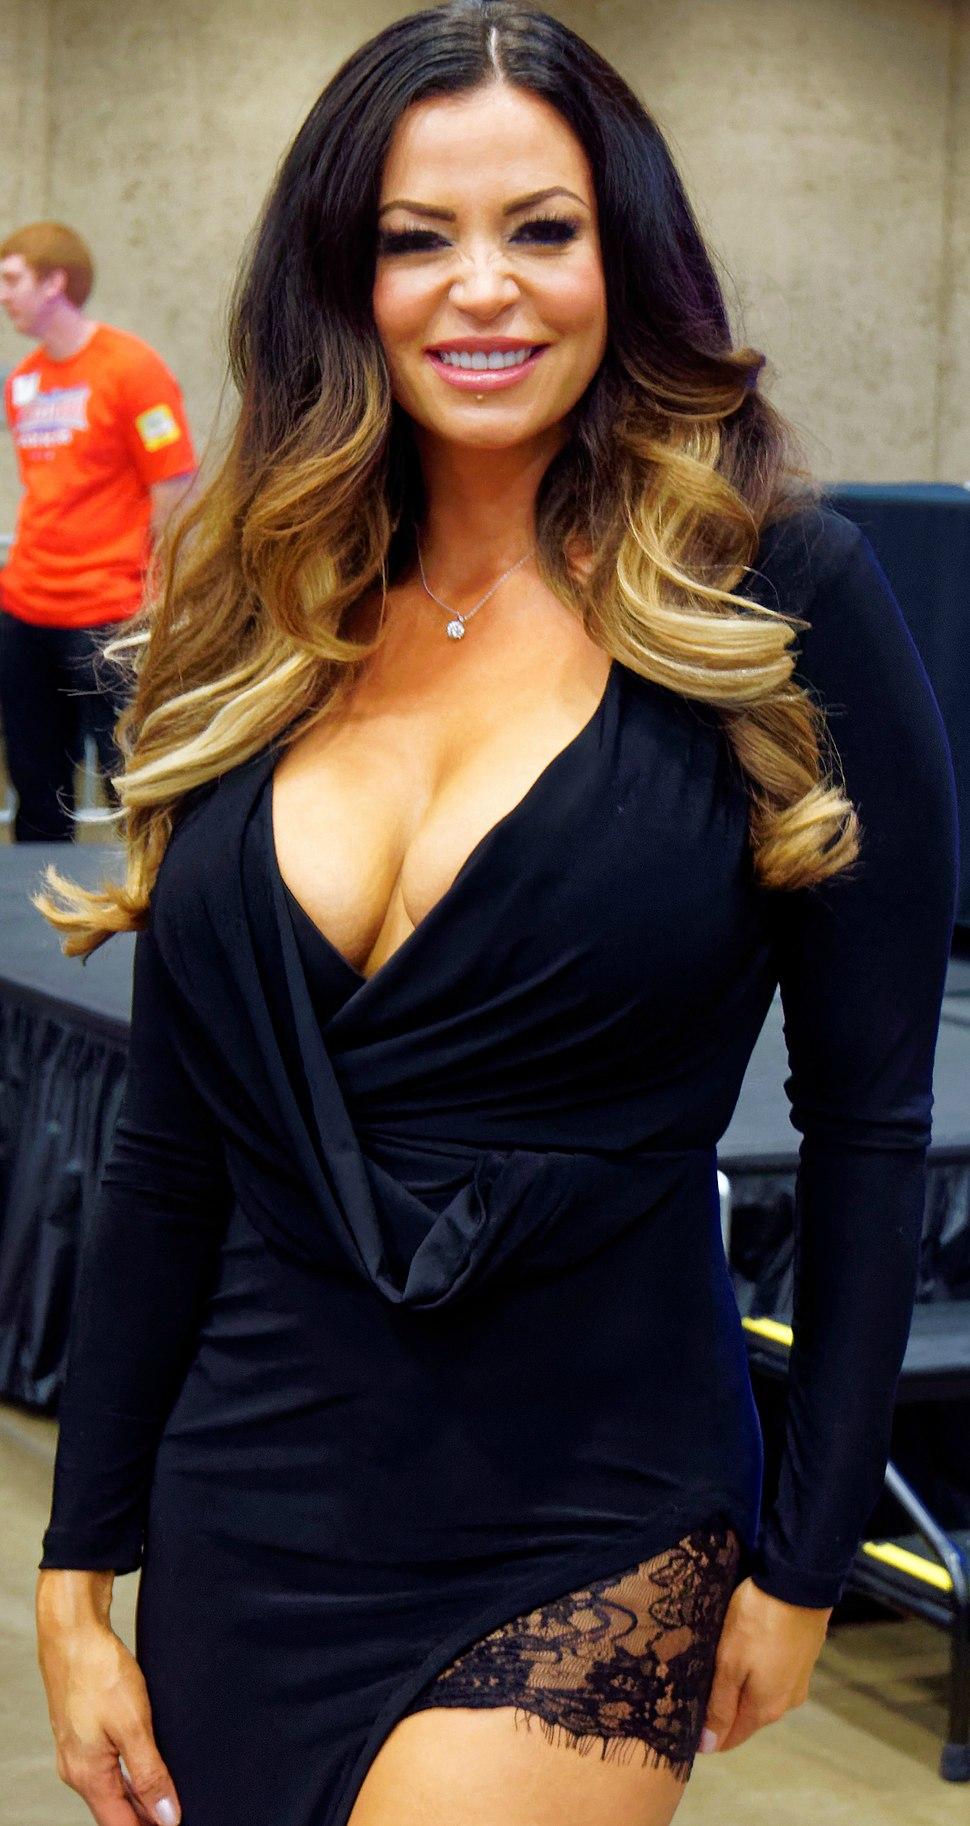 Candice Michelle WrestleMania 32 Axxess